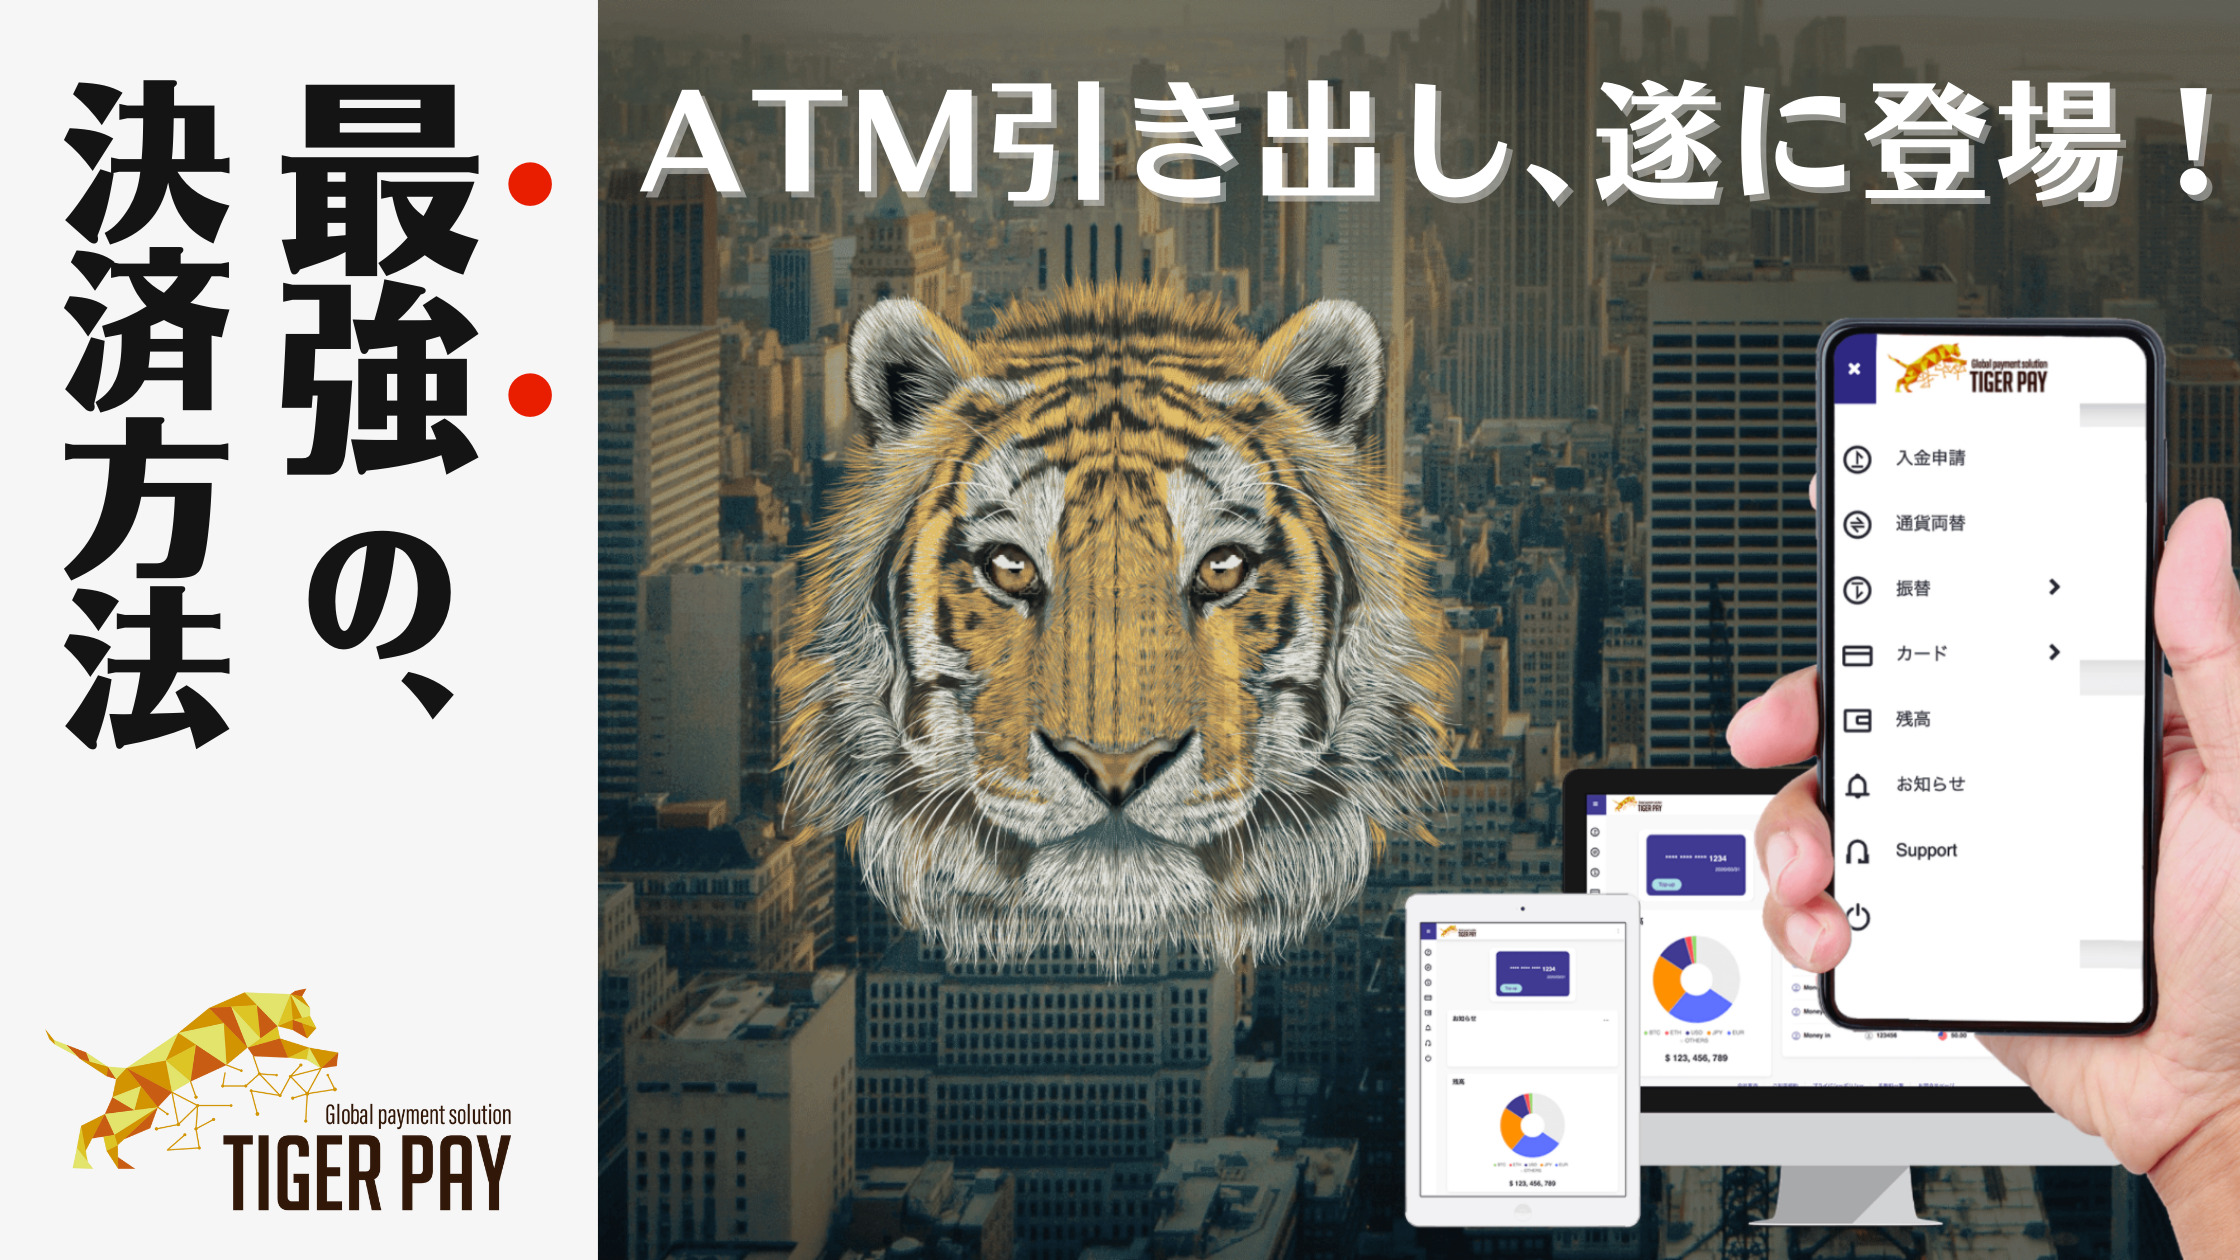 【ATMカード復活!】タイガーペイ(TIGER PAY)の登録方法からカード発行手順まで徹底解説!